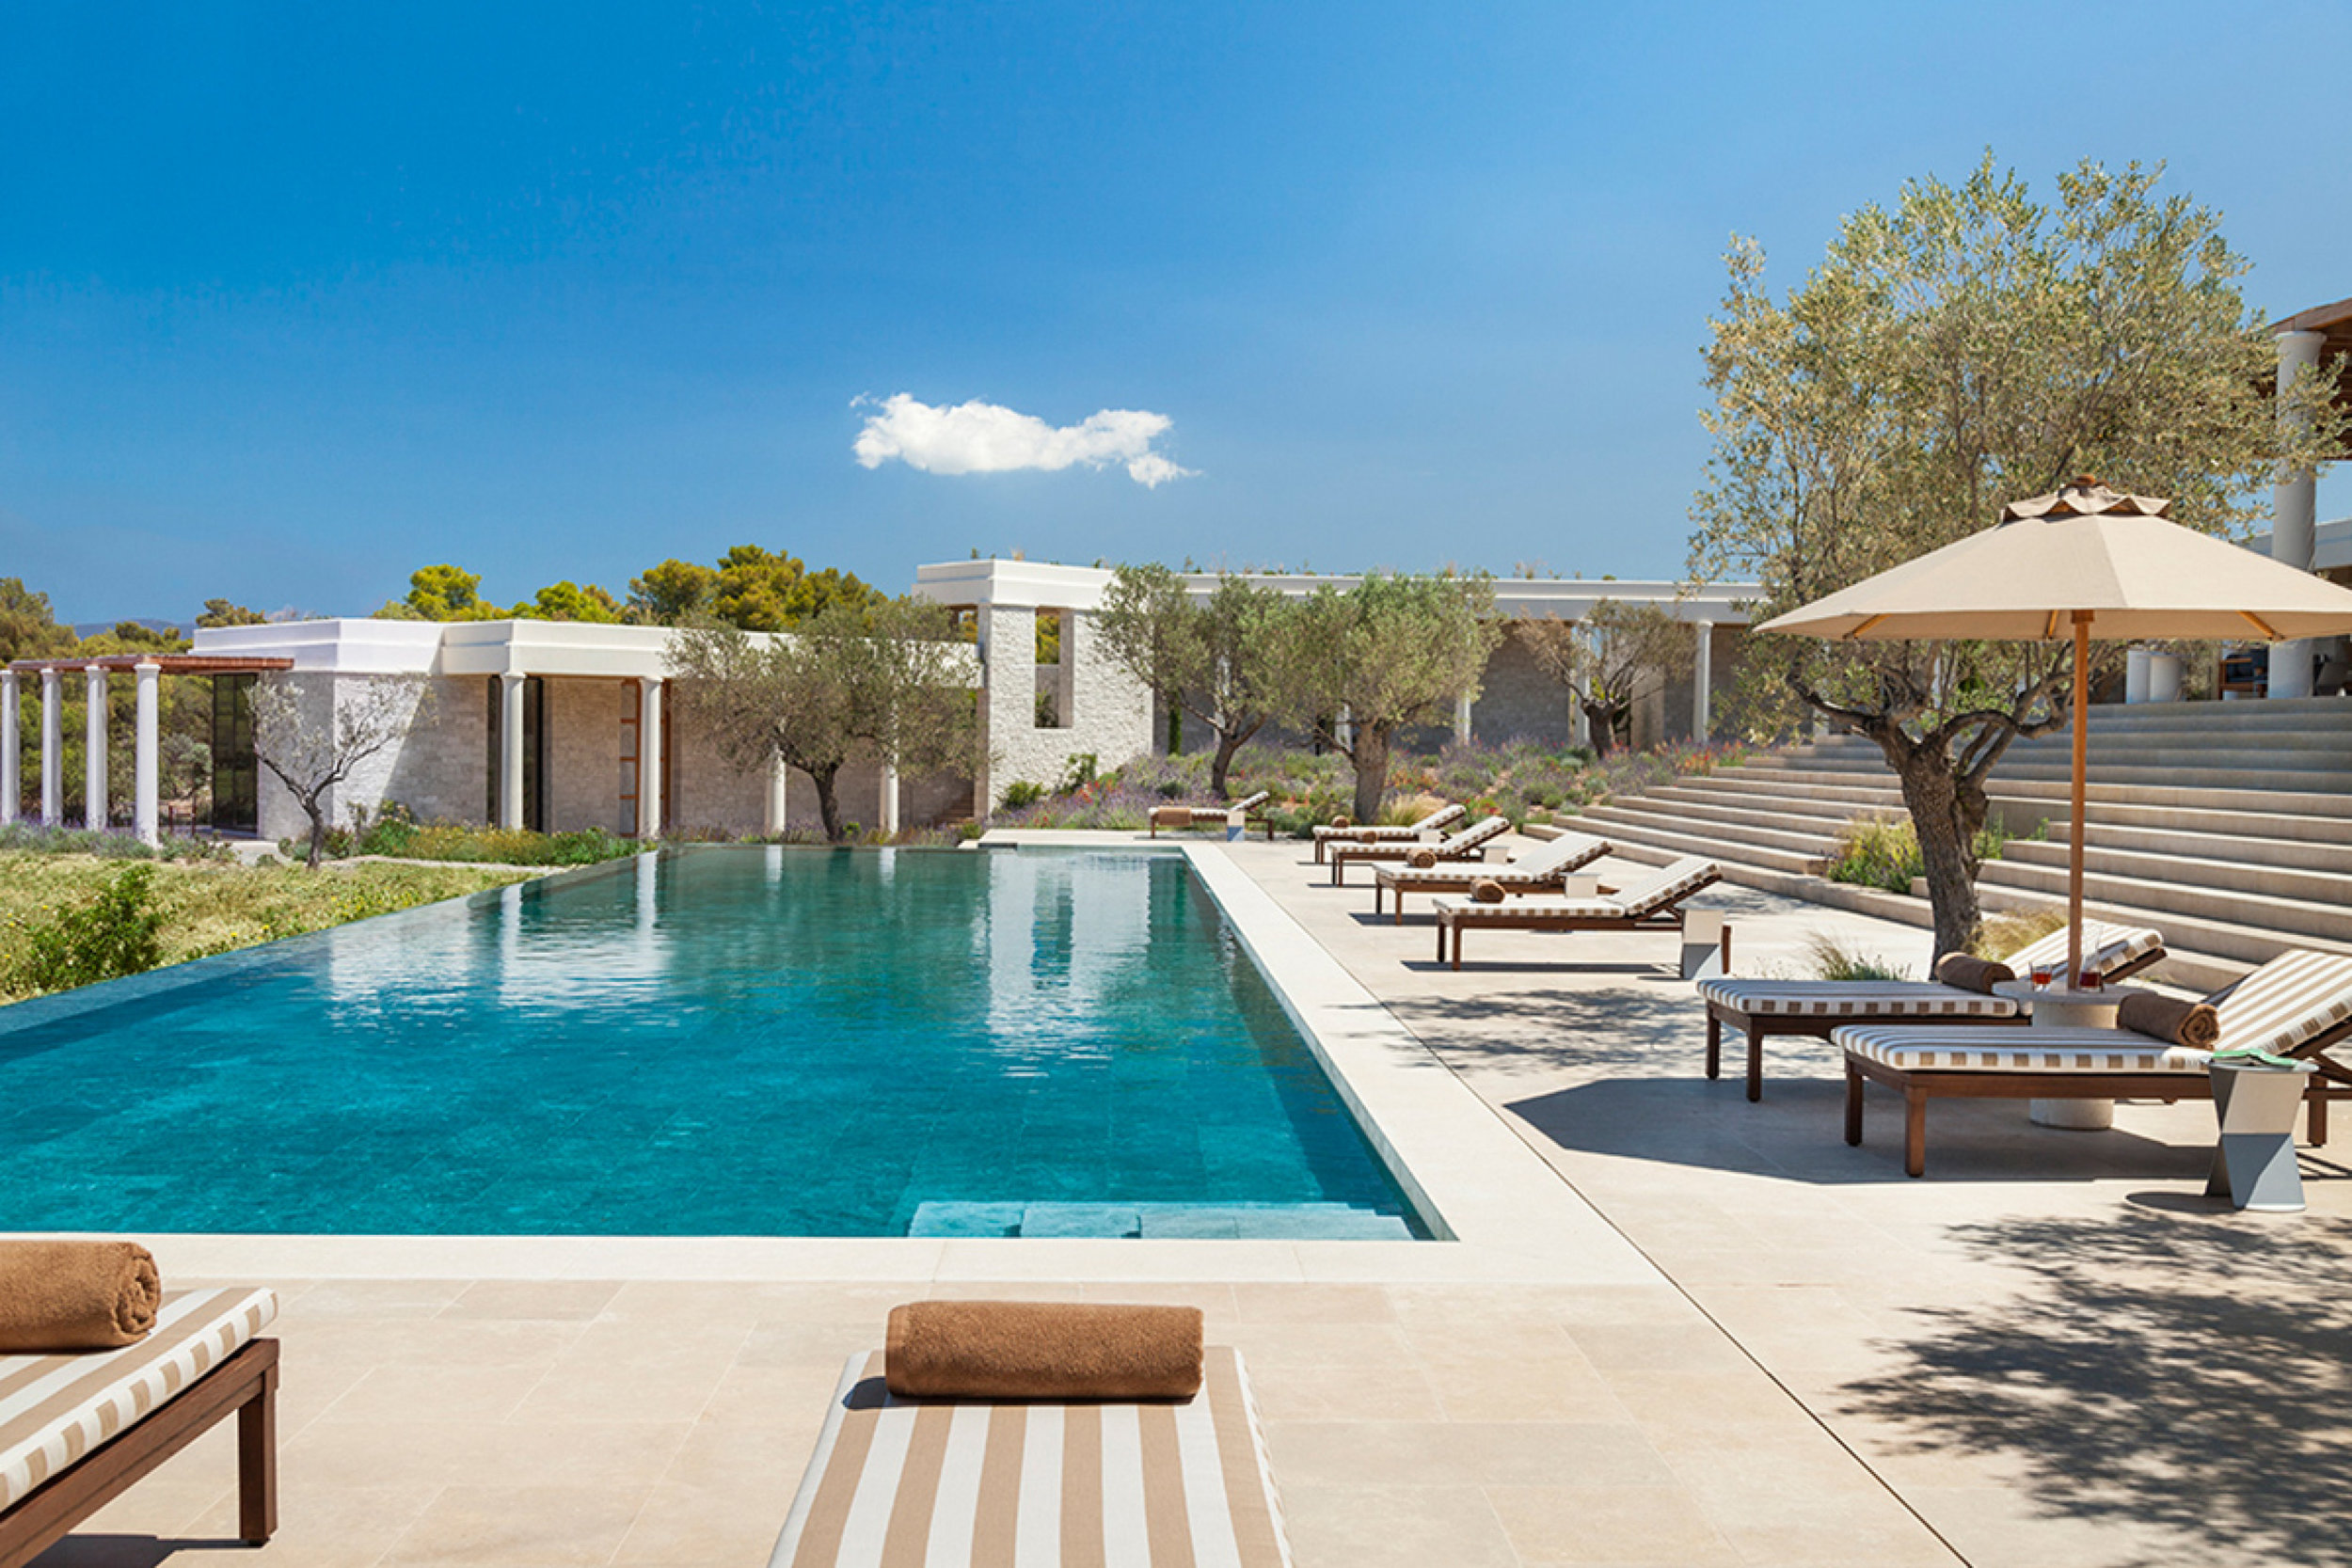 amanzoe-villas-swimming-pool-1200x800_0.jpg